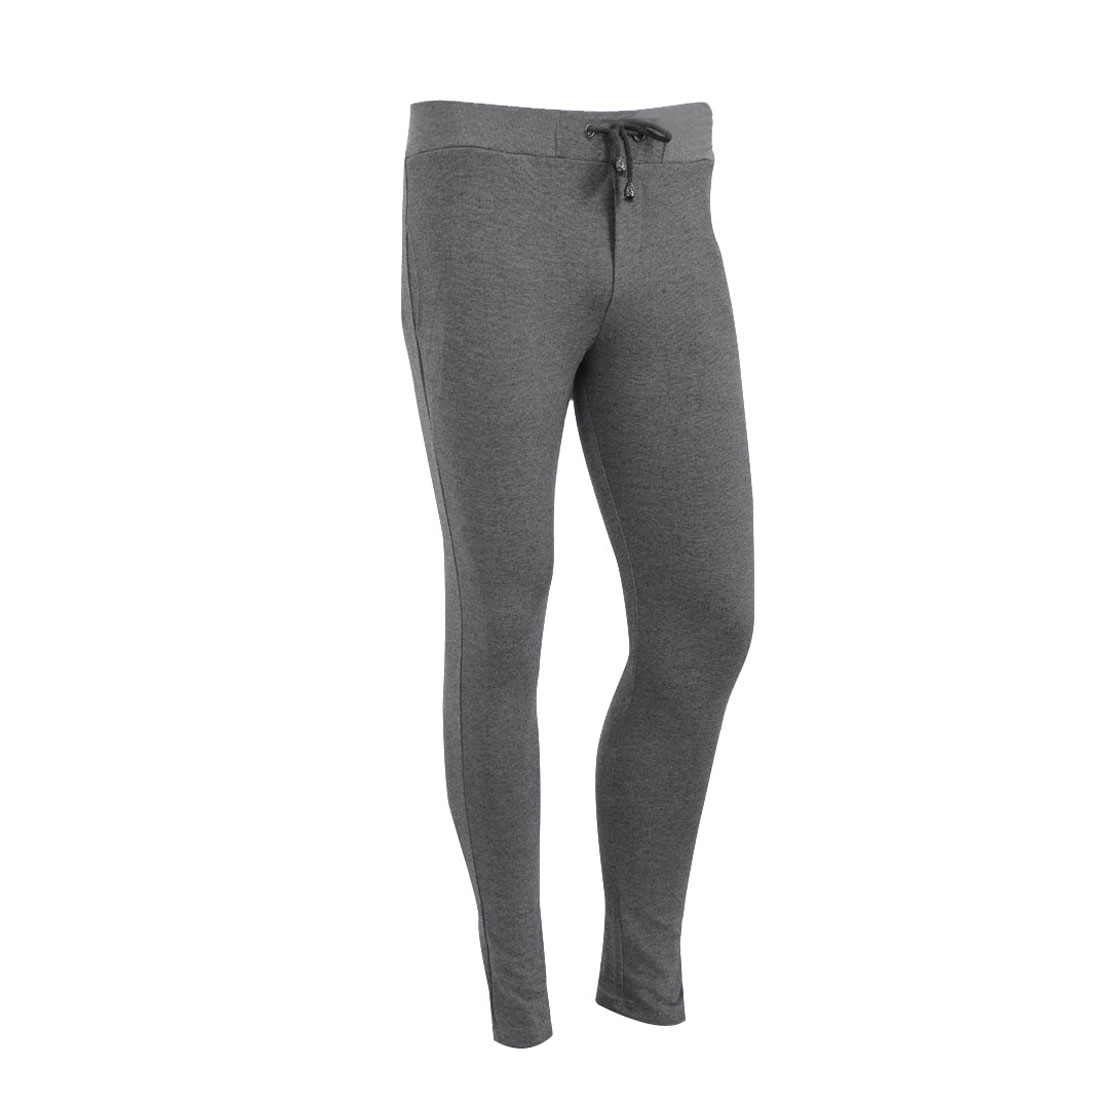 Man Stylish Slant Pockets Stretchy Leisure Harem Pants Light Gray W28